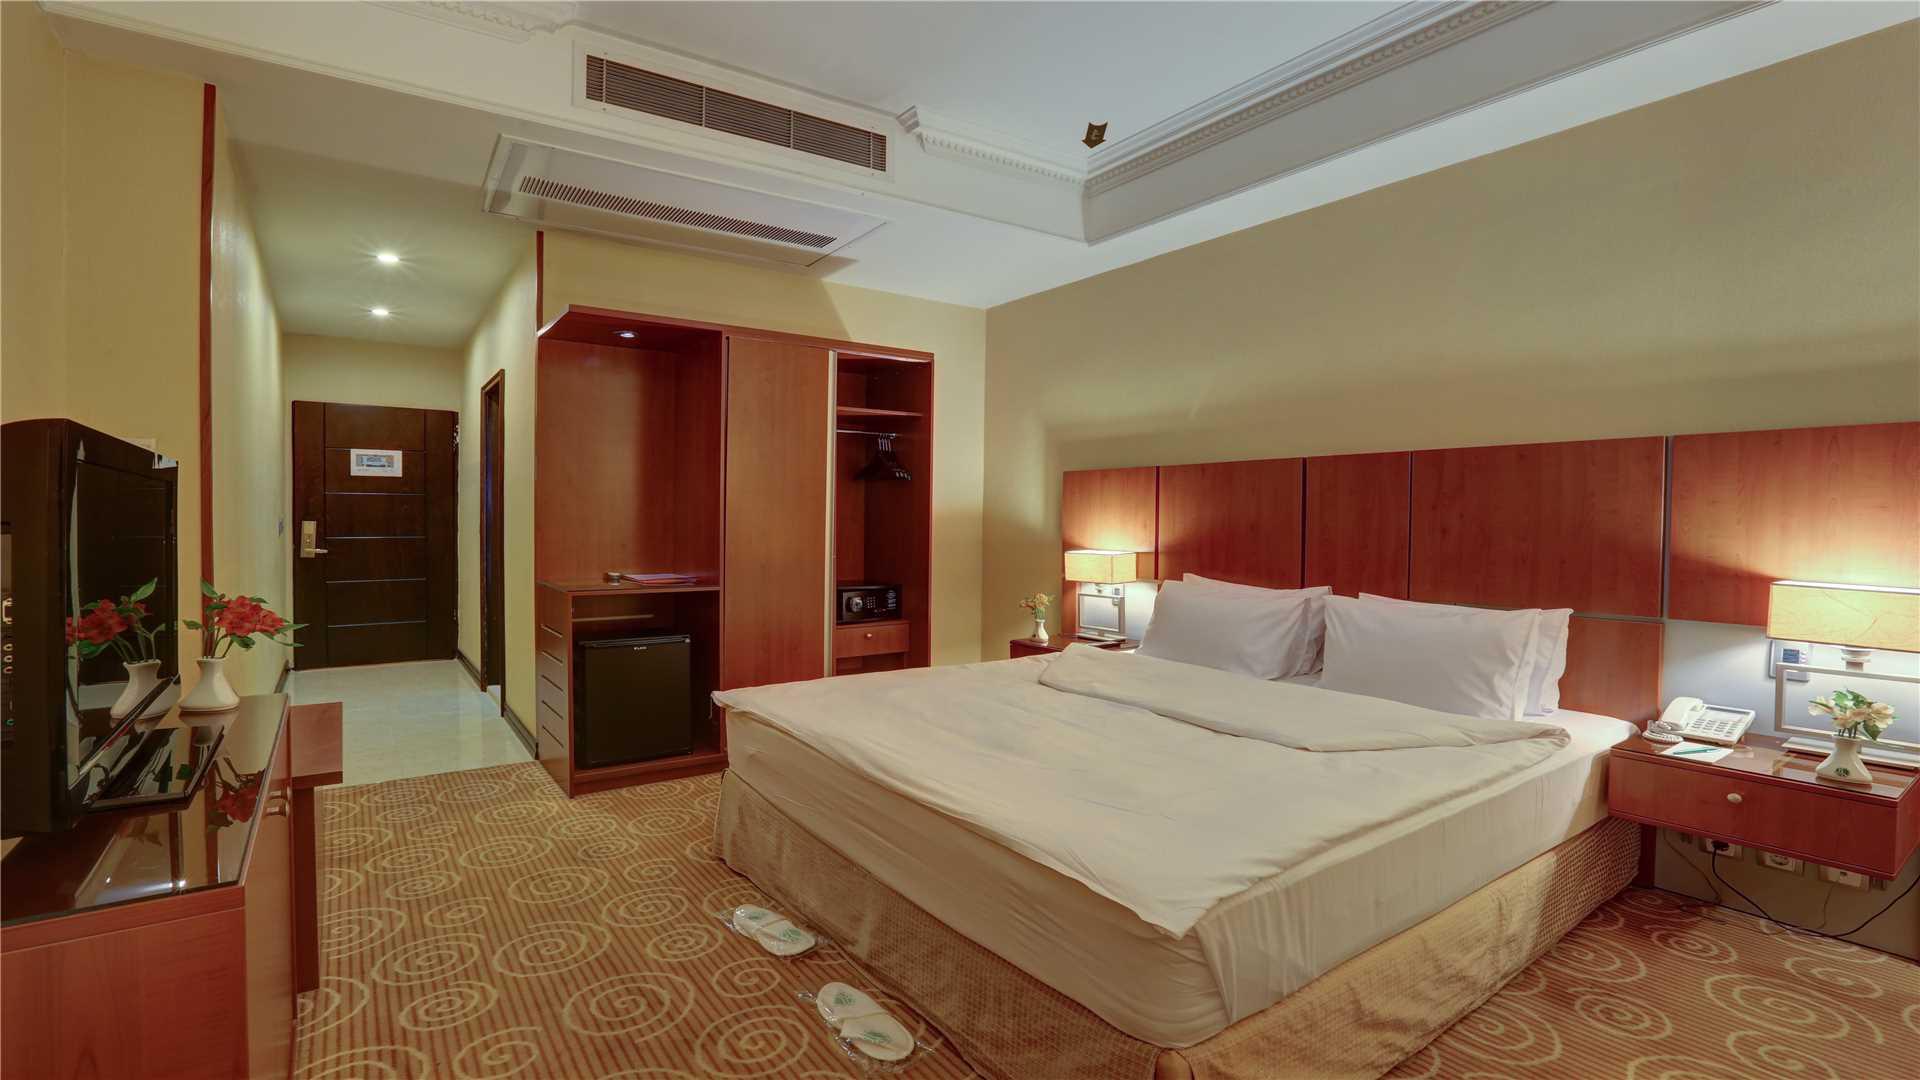 Grand Hotel II Doppelzimmer